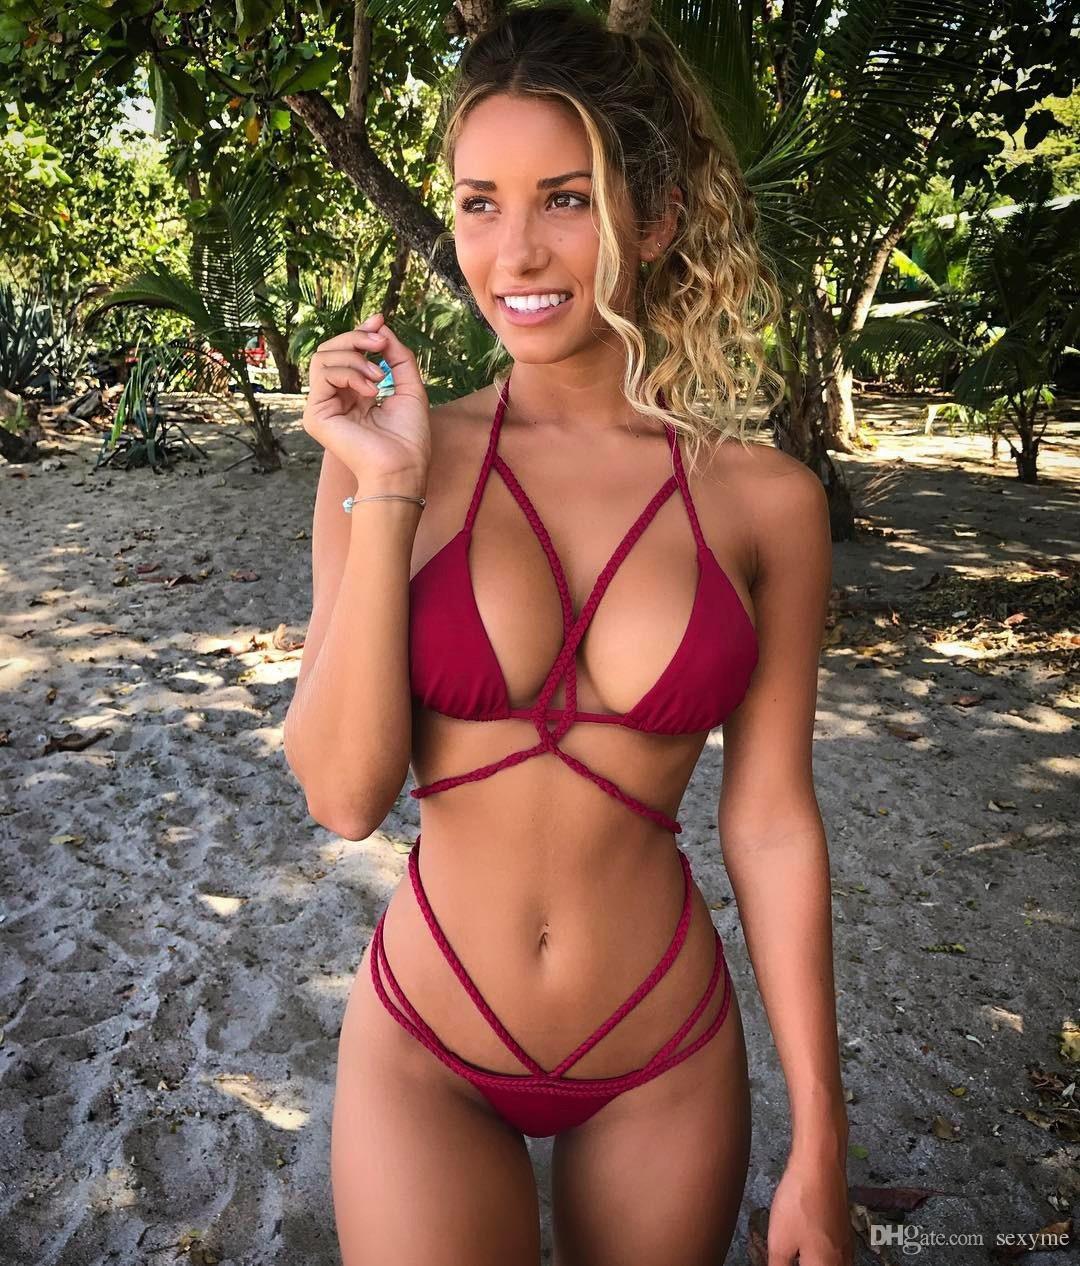 997b70c8b7301 2019 Women Brazilian Thong Bikini Sets Criss Cross Tied Knot Swimsuits Pad  Bandage Beach Wear Swimwear Female Bathing Suit From Sexyme